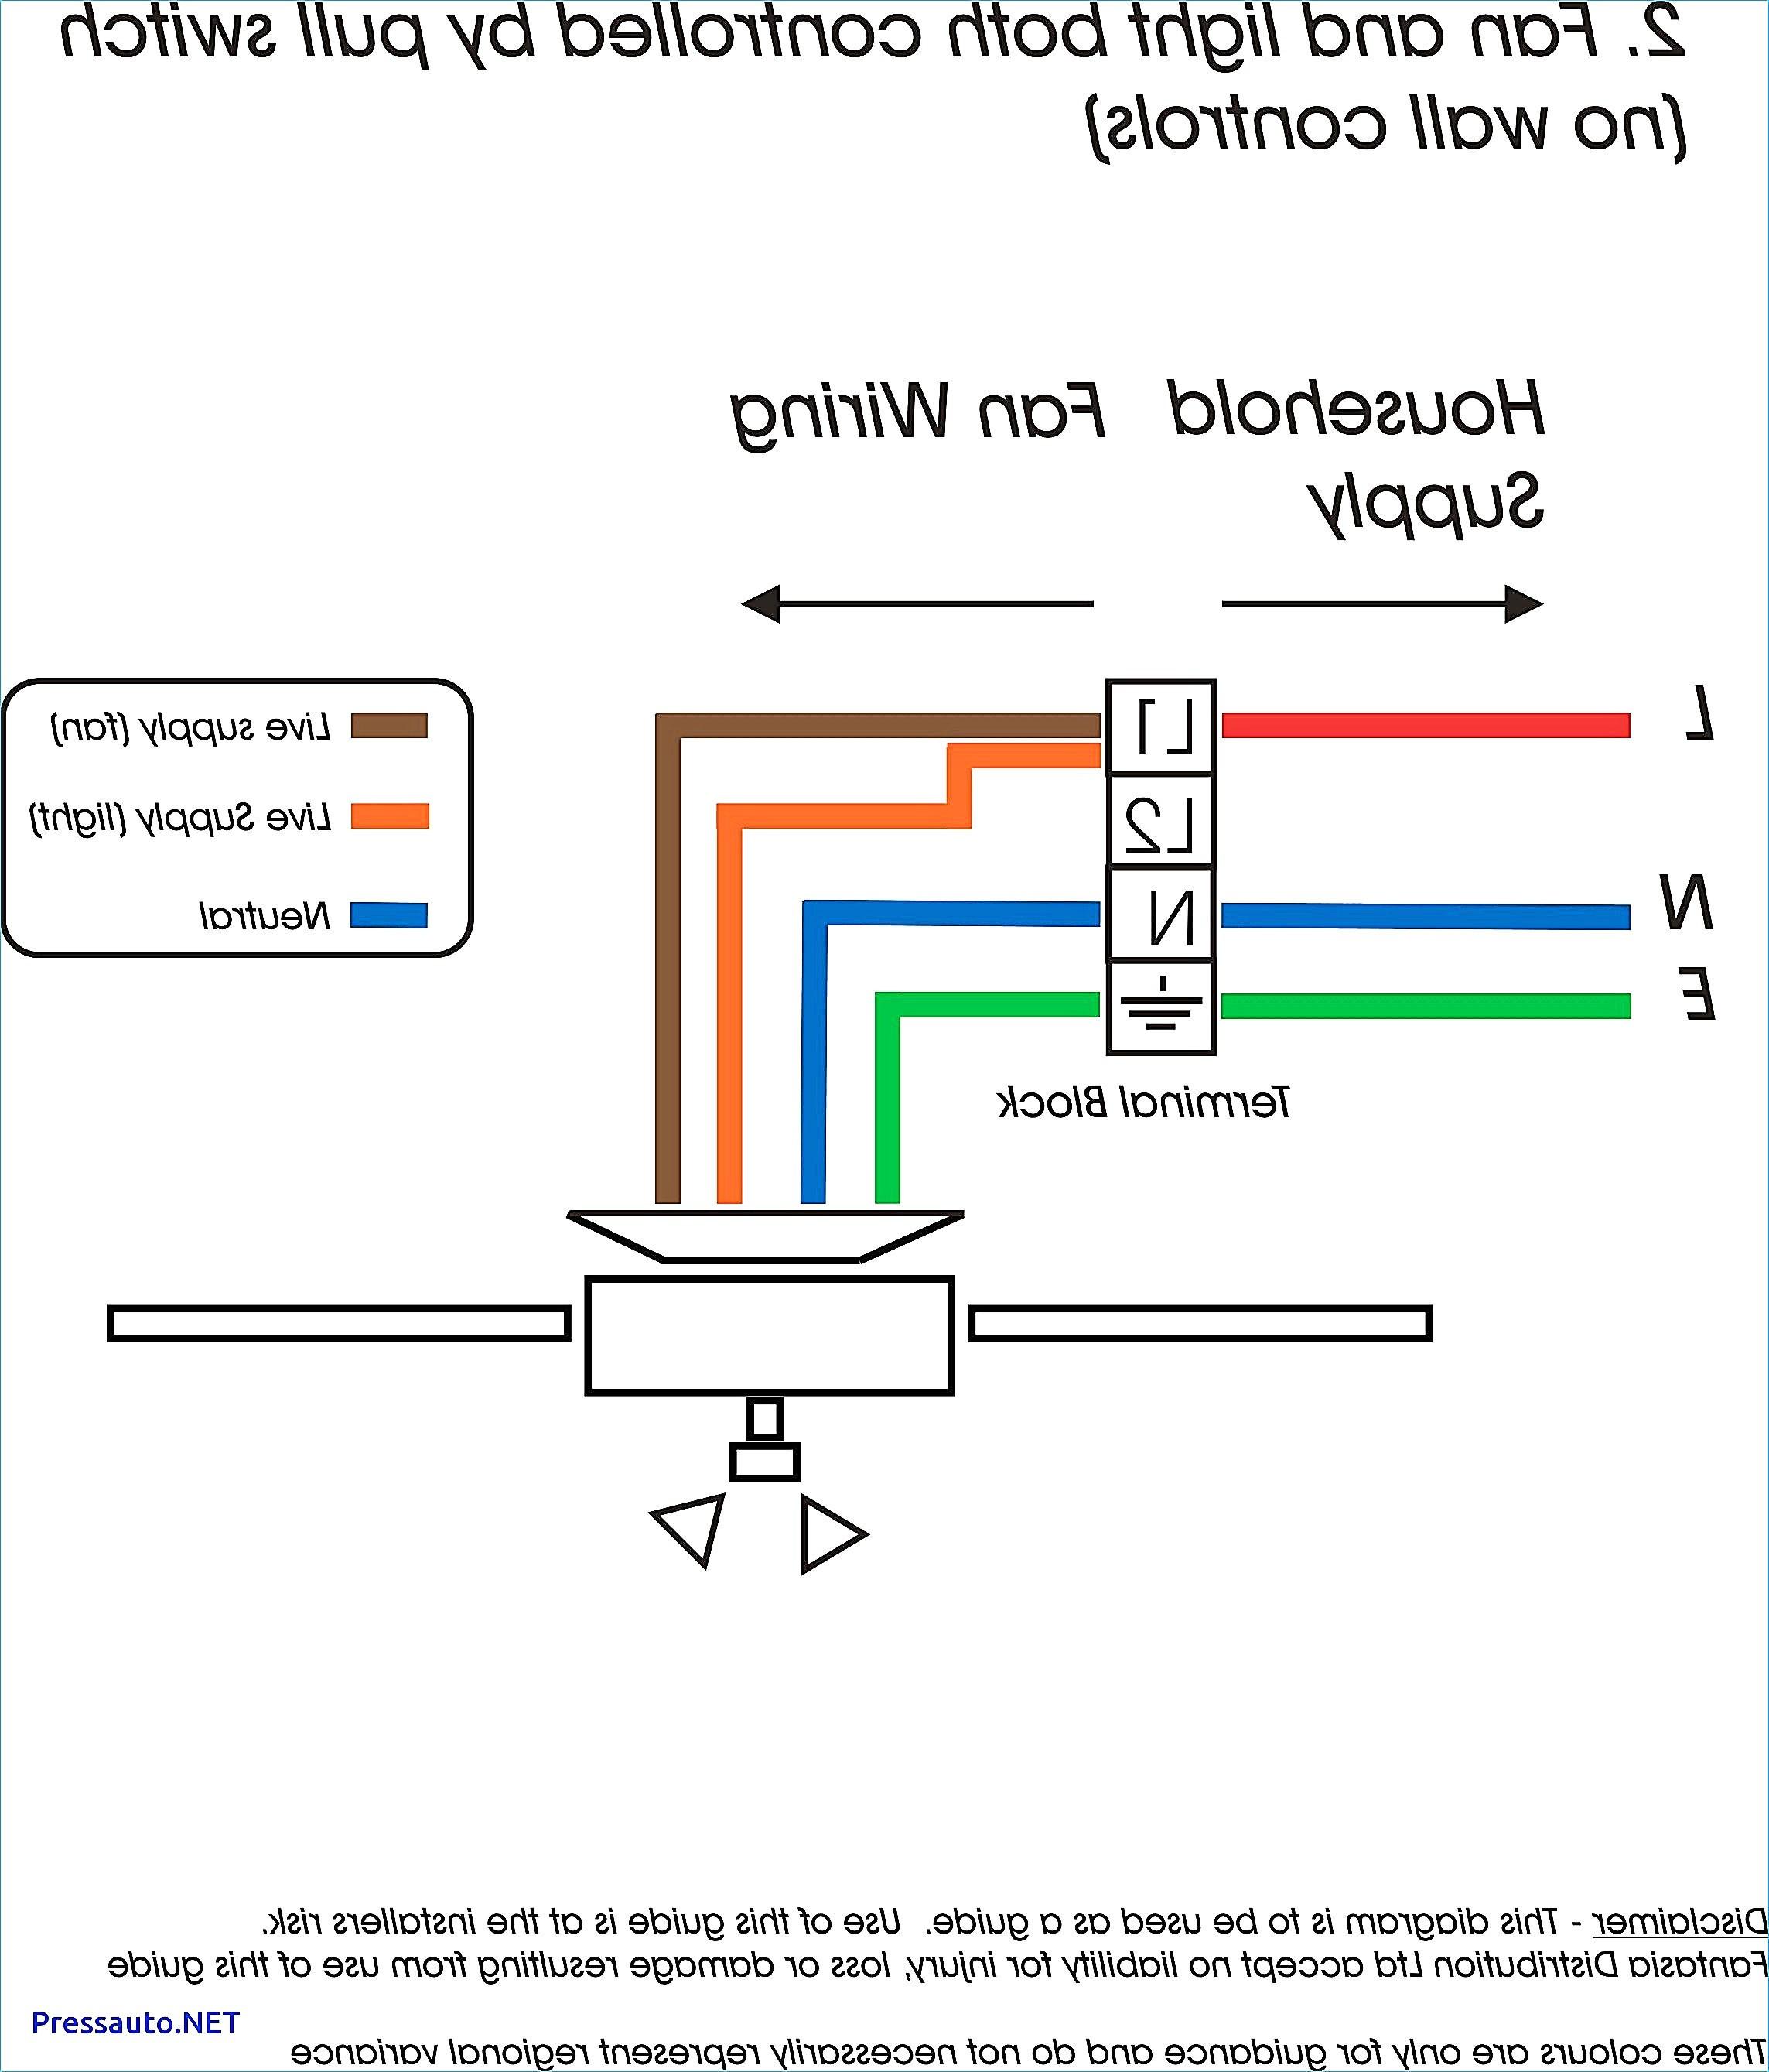 Wiring Diagram Ptc Relay New Wiring Diagram Ptc Relay Best Embraco Relay Wiring Diagram Save